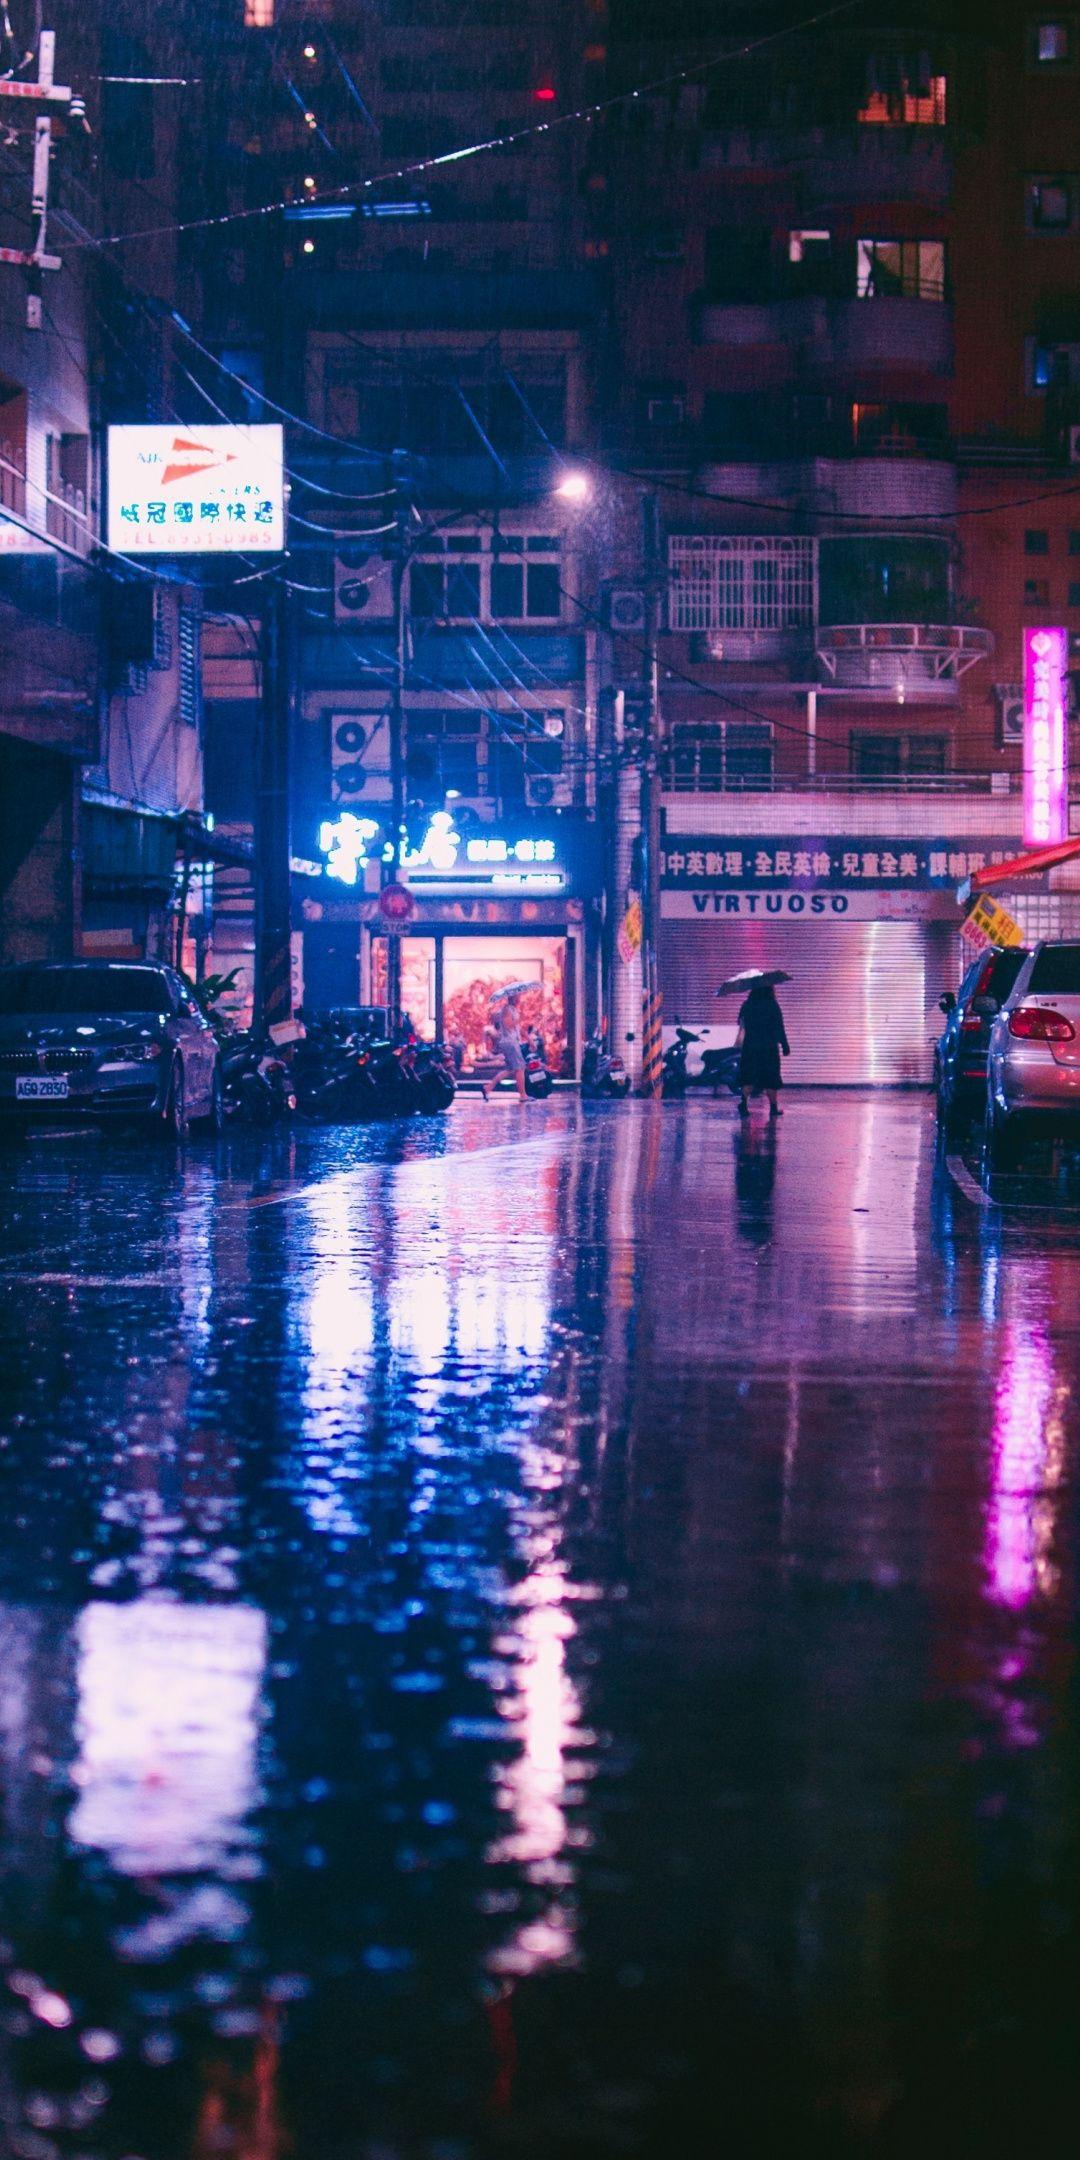 Rain, Lights, City Street, Reflections, 1080x2160